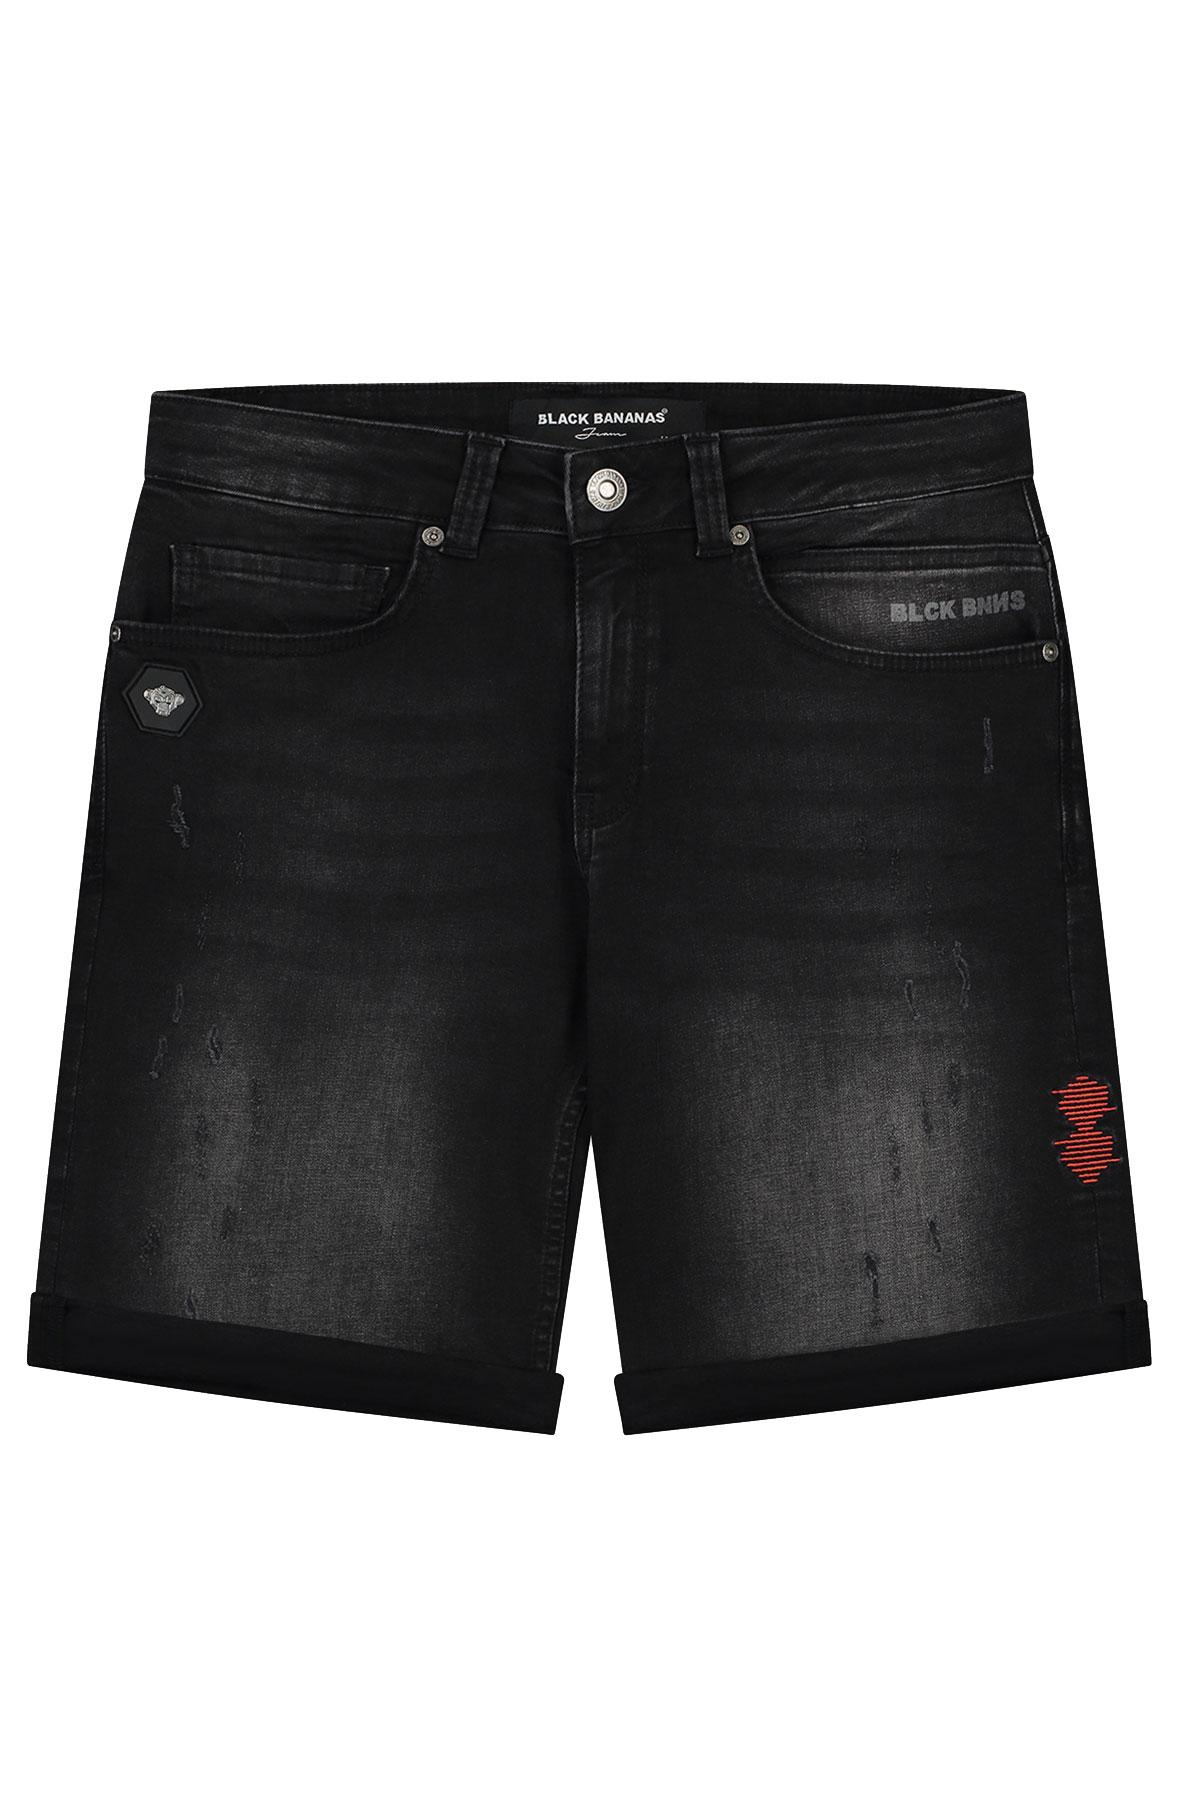 dex-scratched-shorts-black_Front (1)